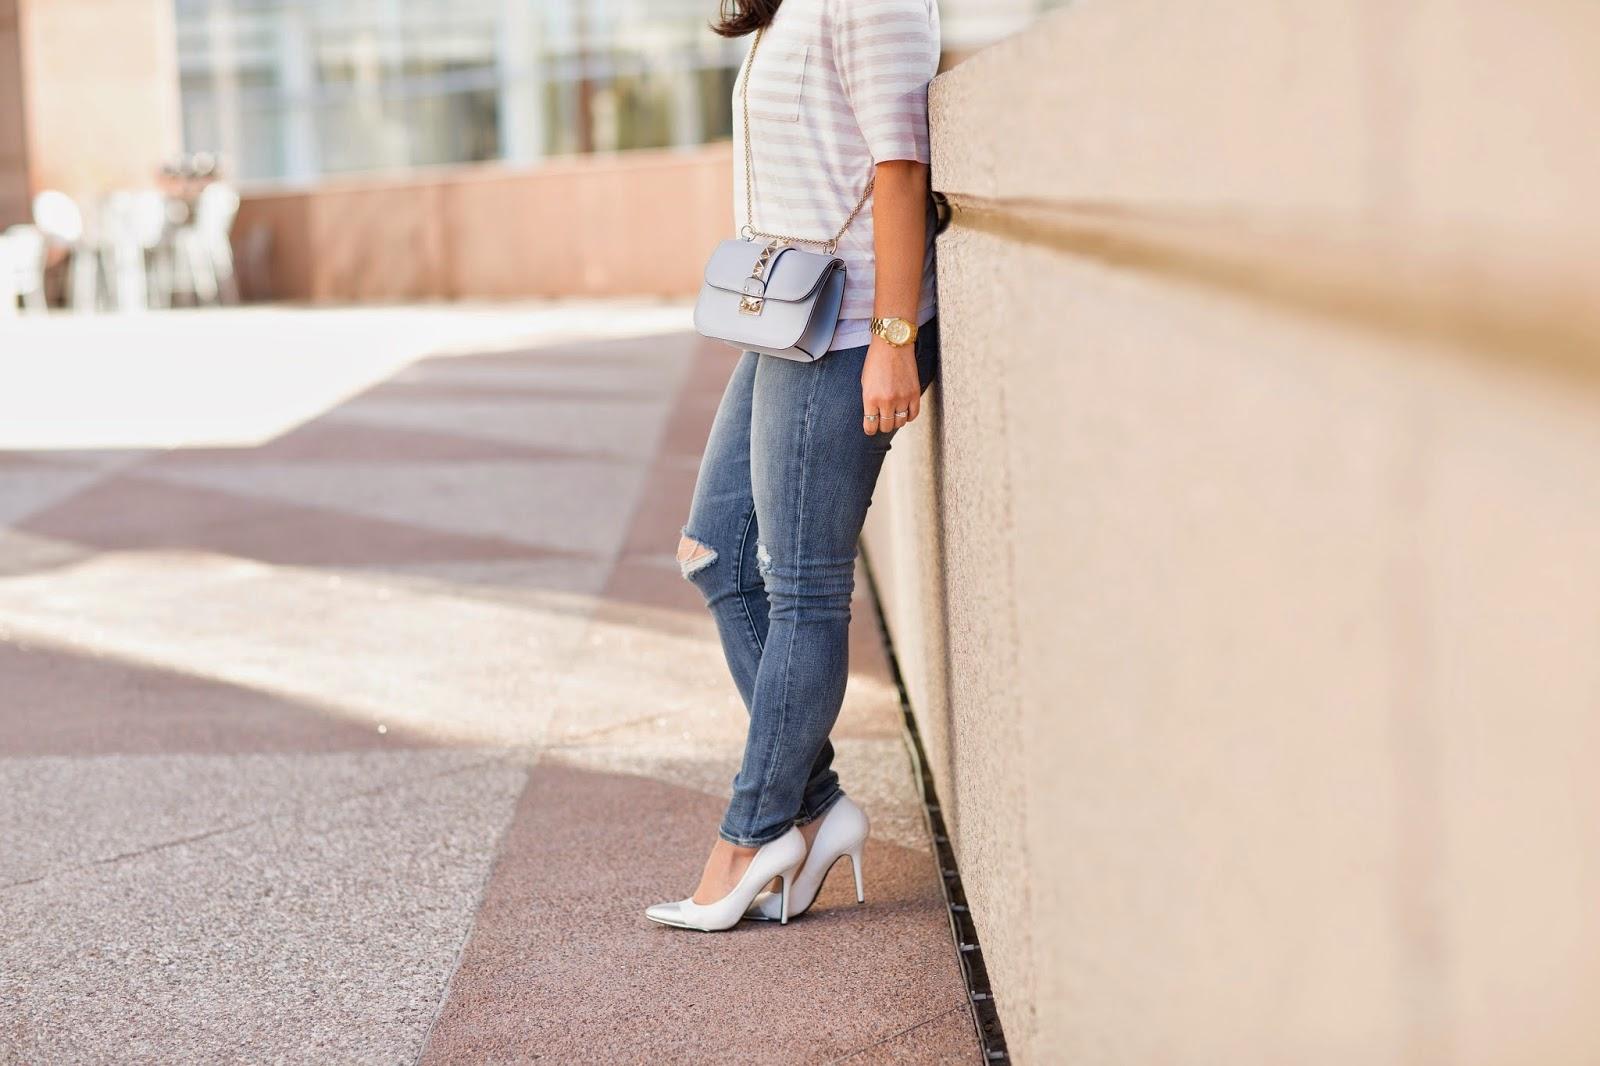 simplyxclassic, gap shirt, striped shirt, pastels, pink striped shirt, valentino shoulder bag, valentino bag, orange county, blogger, fashion blogger, segerstrom